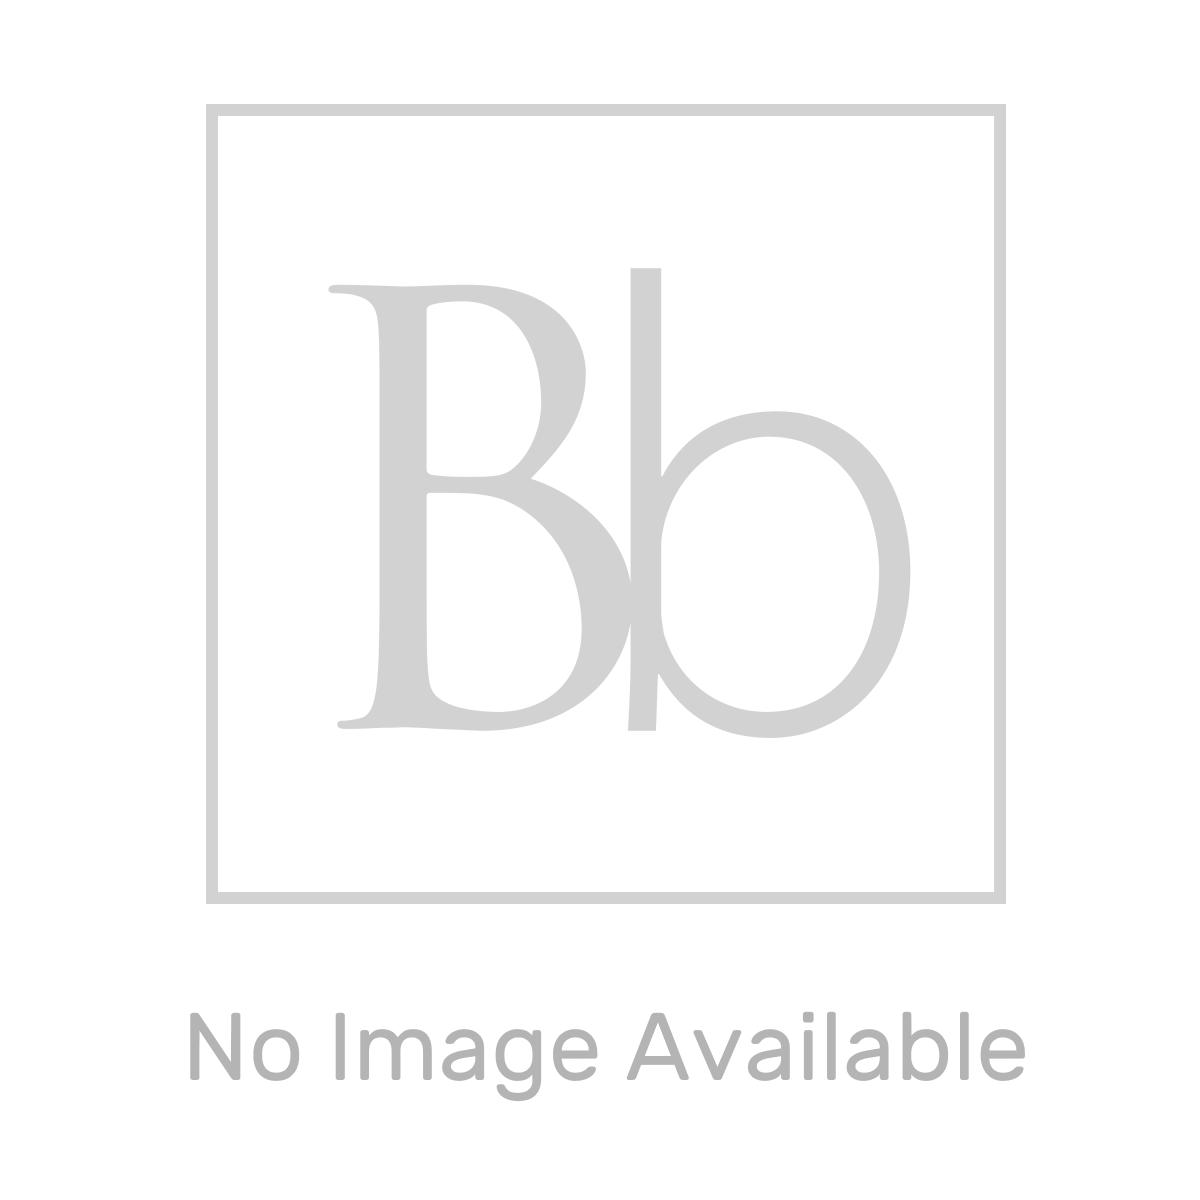 Cassellie Luton Straight Single End Round Style Bath